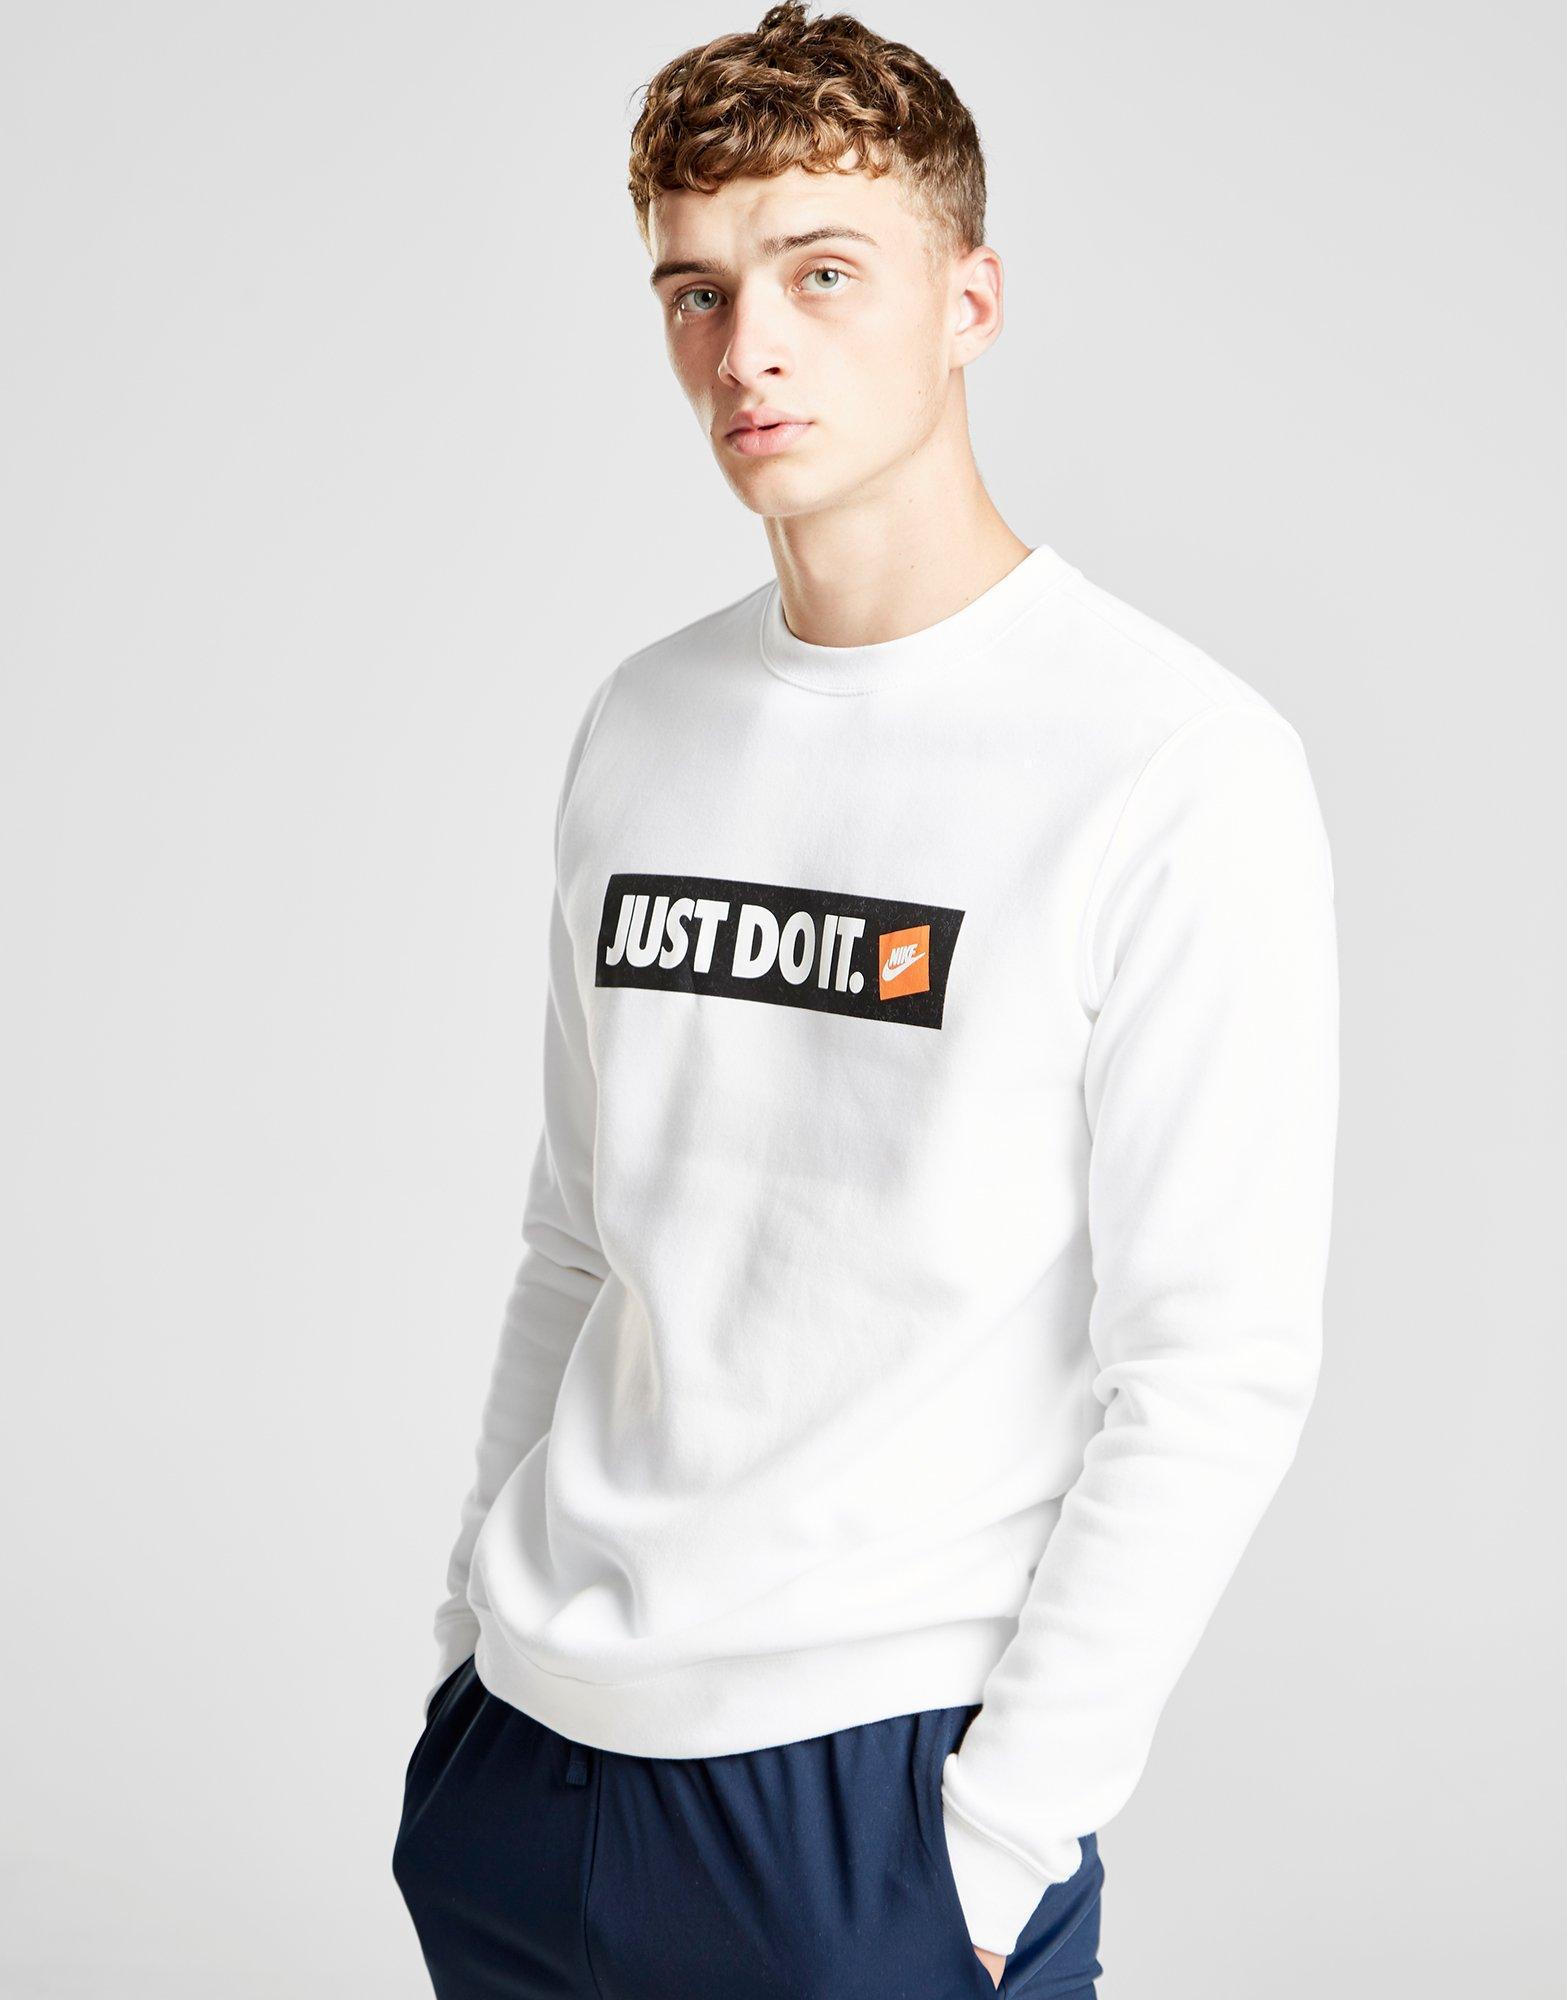 d29938dc Lyst - Nike Just Do It Logo Sweatshirt in White for Men